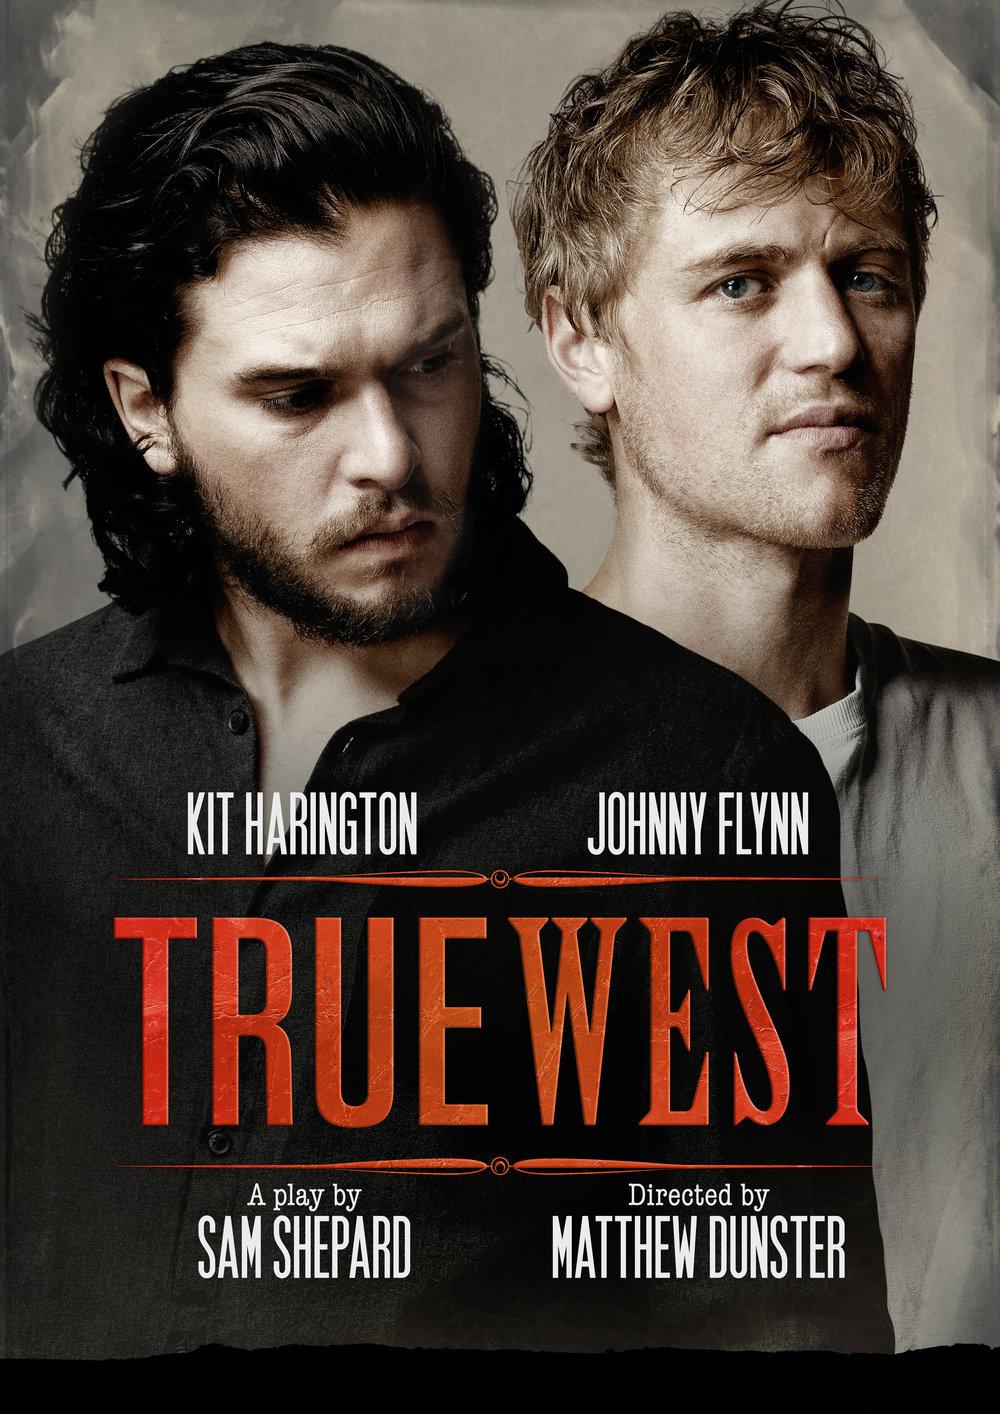 truewest-PR-artwork-billing.jpg